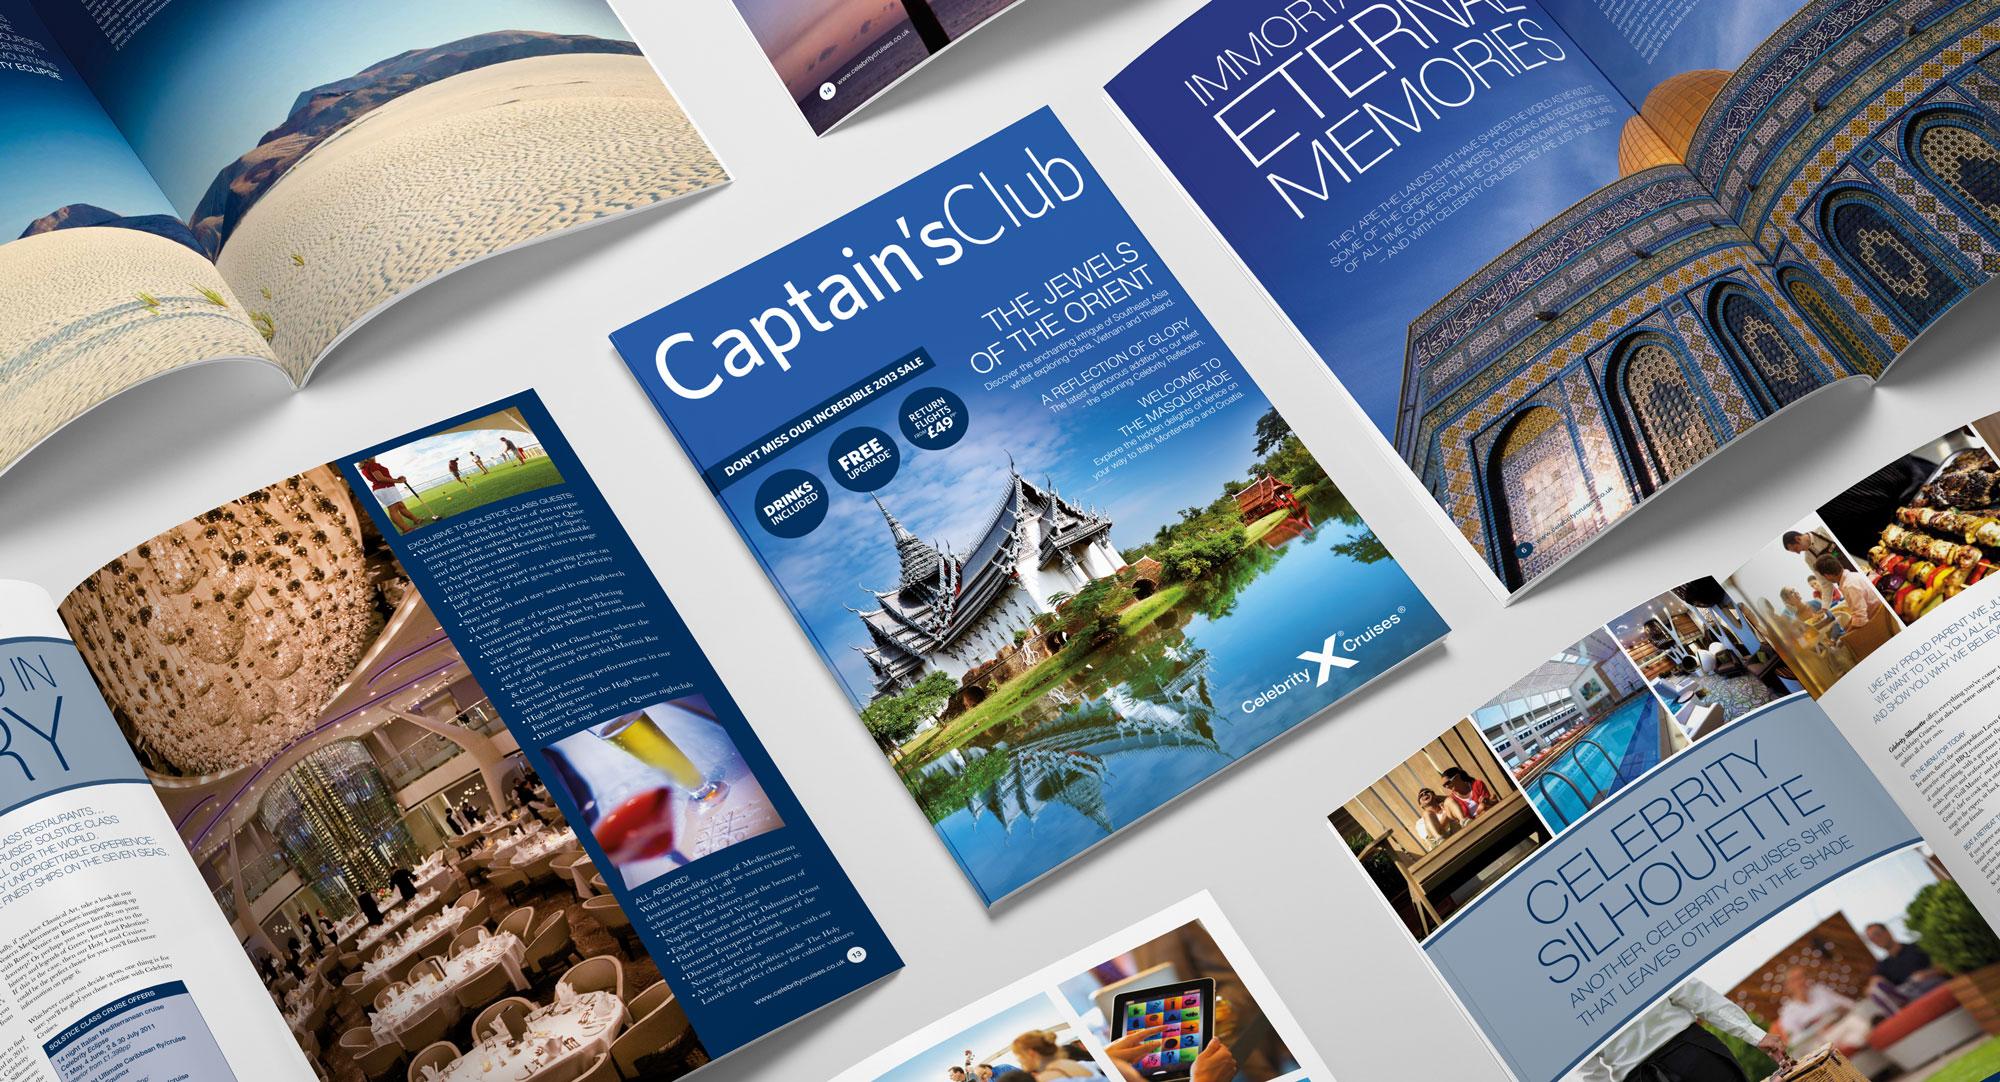 celebrity cruises captains club magazines